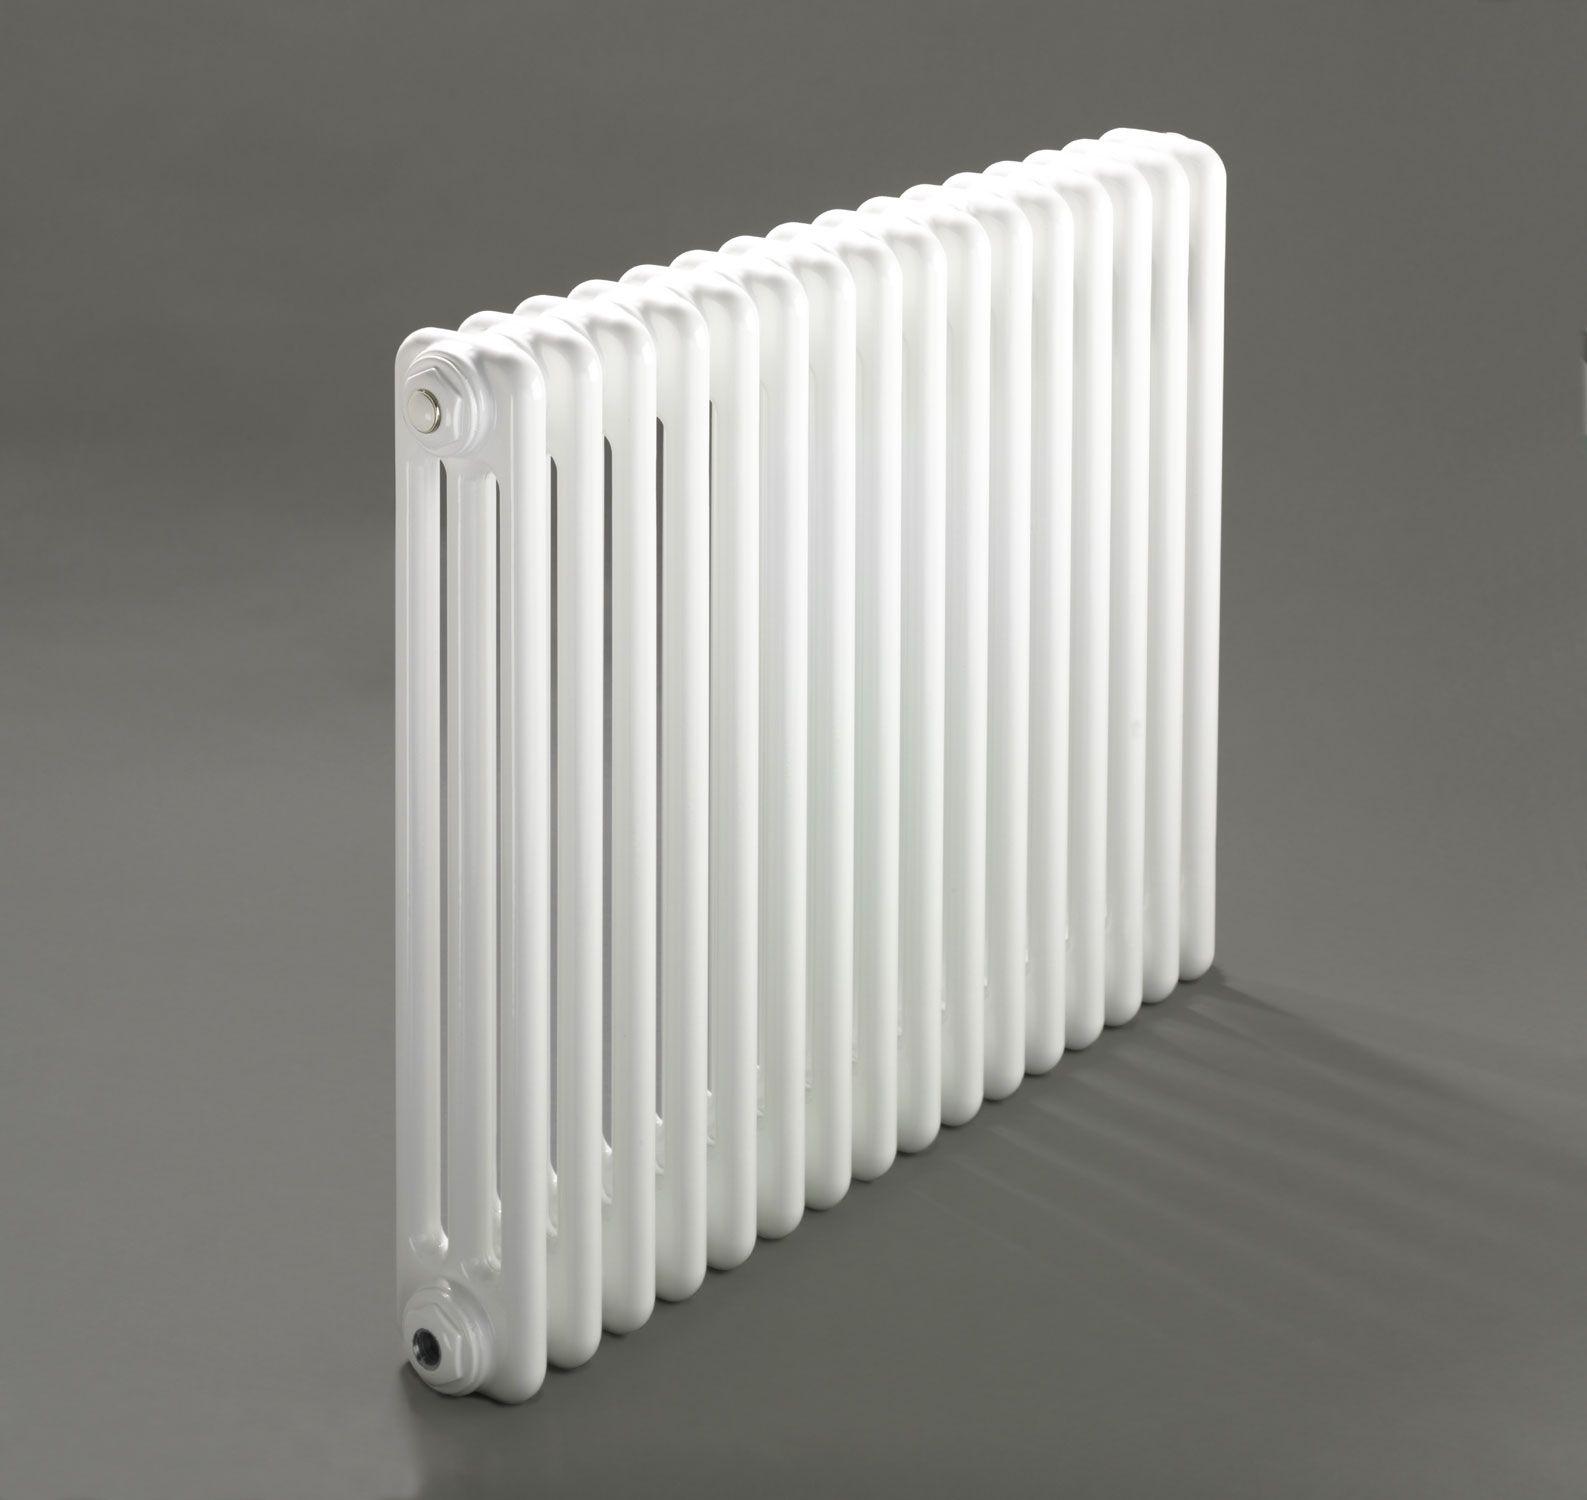 Introducing the Towelrads Windsor DeLonghi column